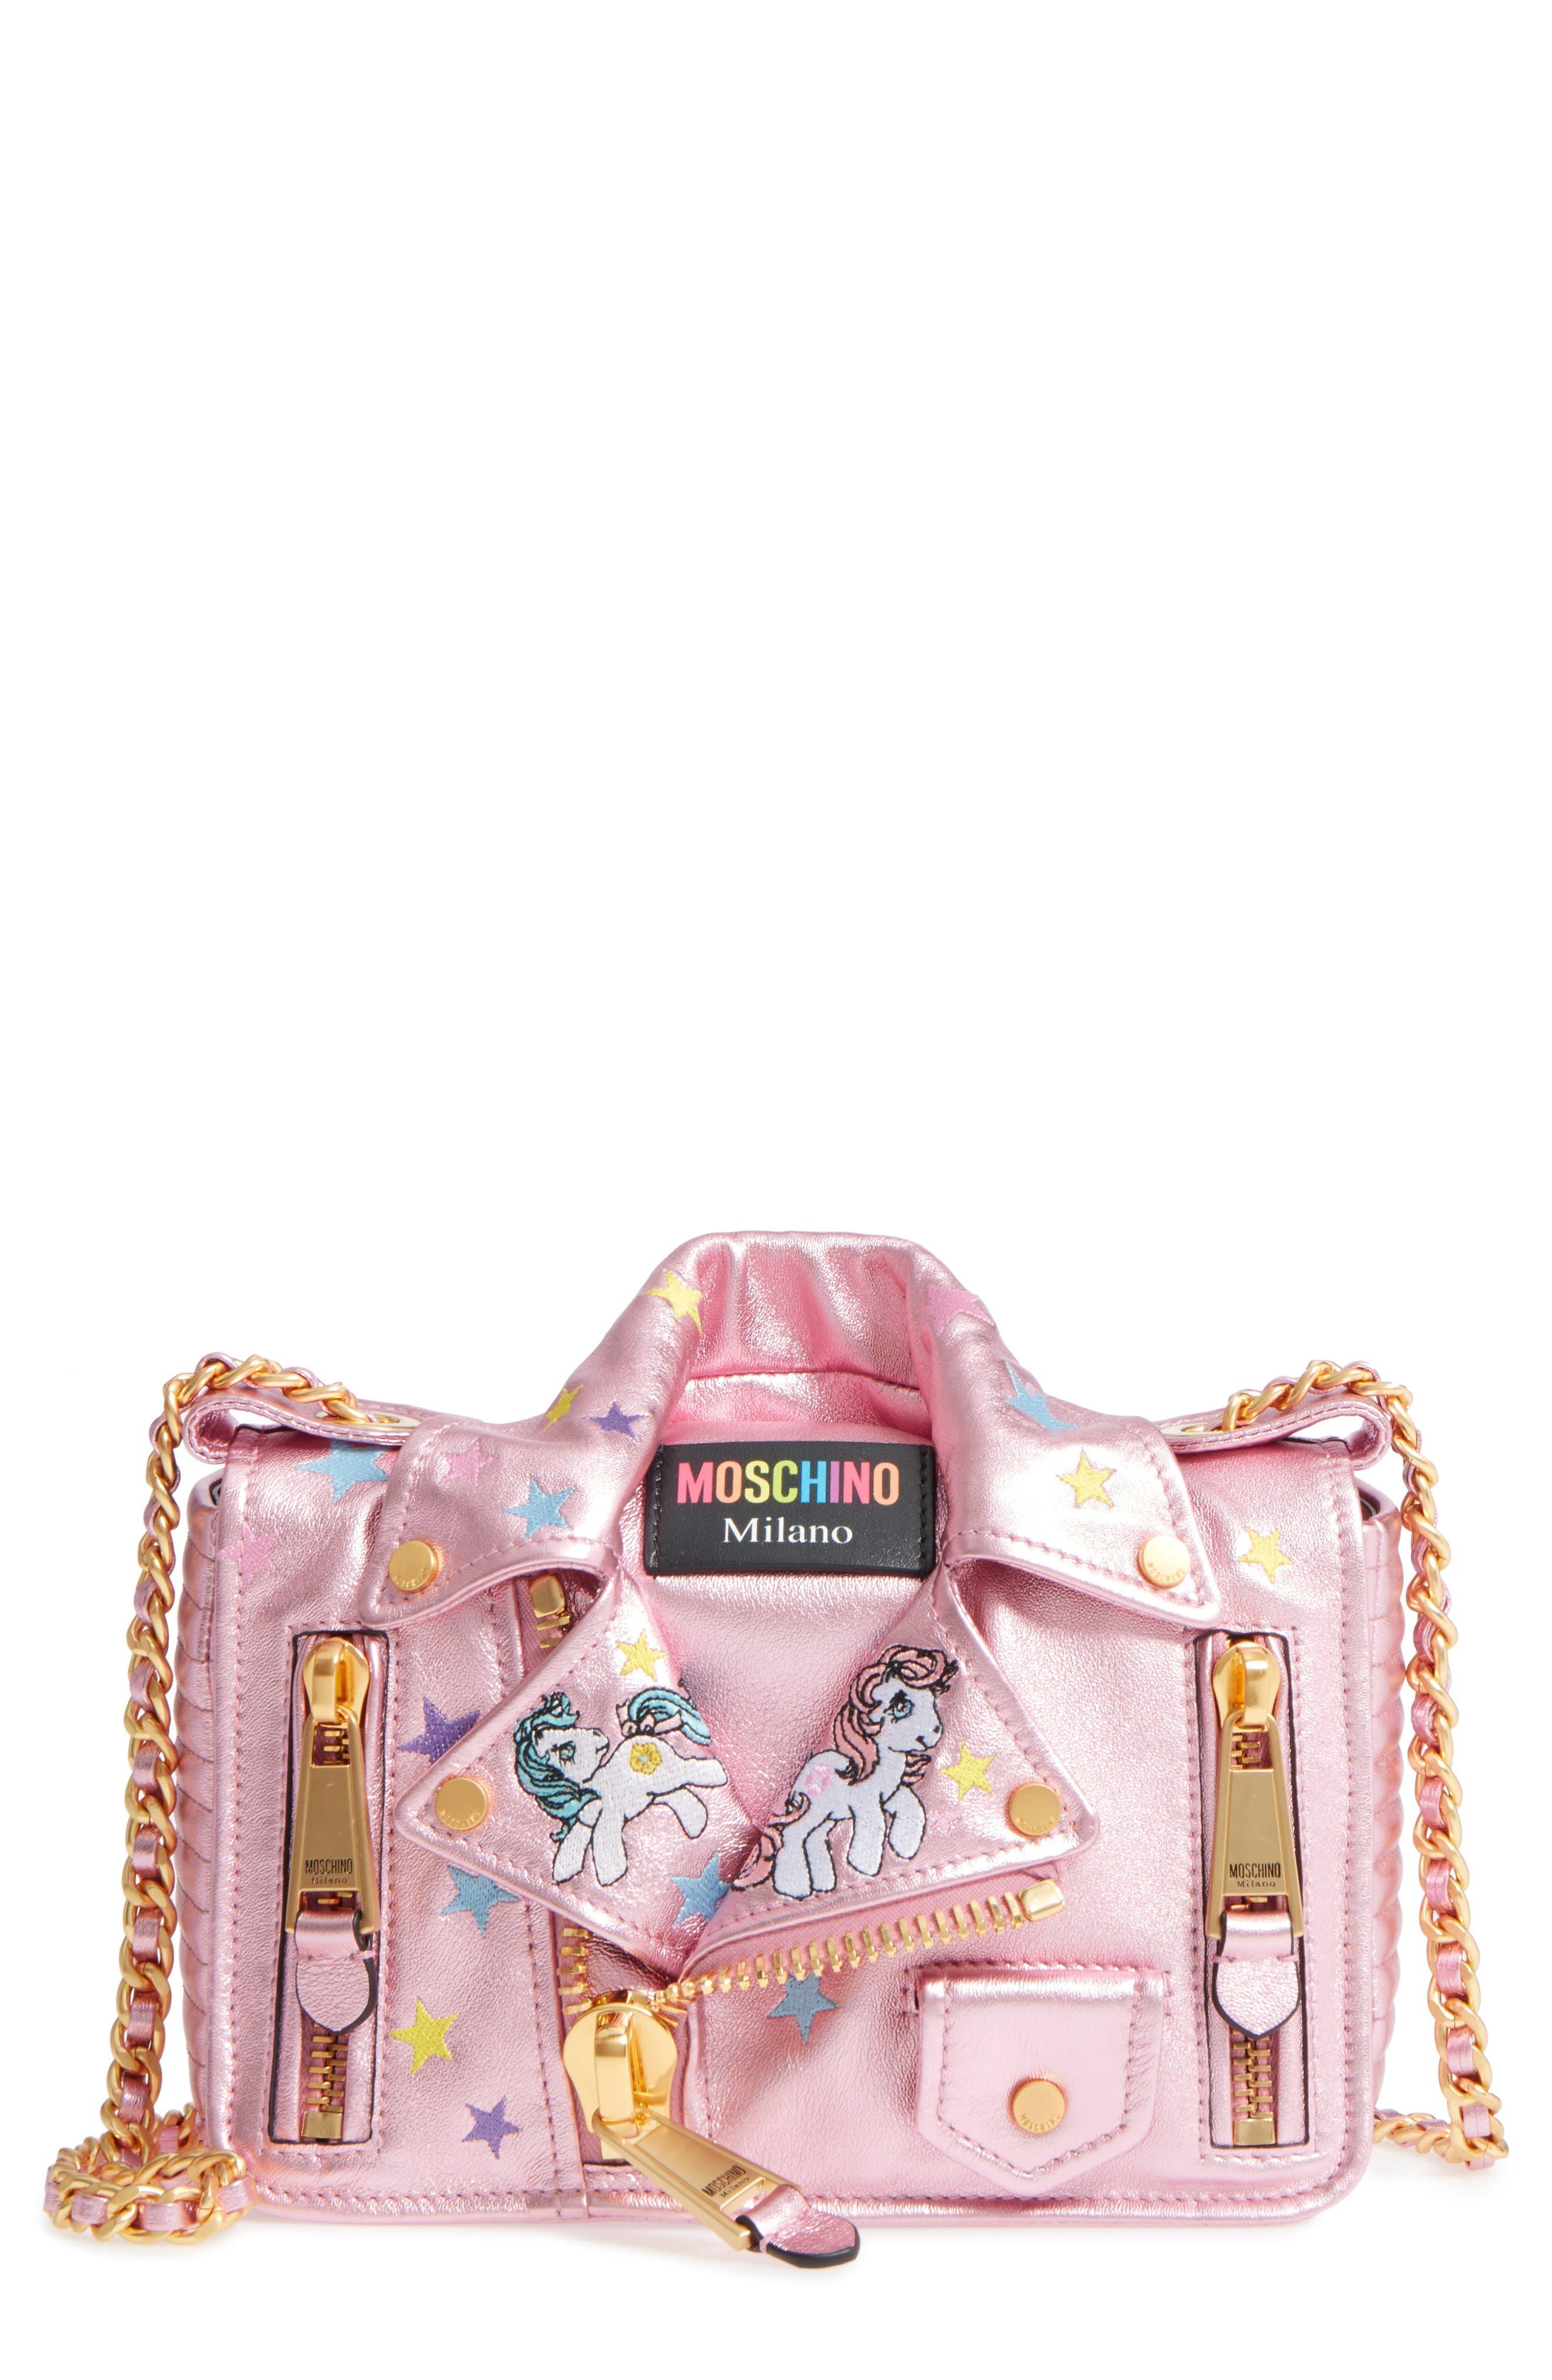 x My Little Pony Biker Jacket Metallic Leather Crossbody Bag,                             Main thumbnail 1, color,                             Pink